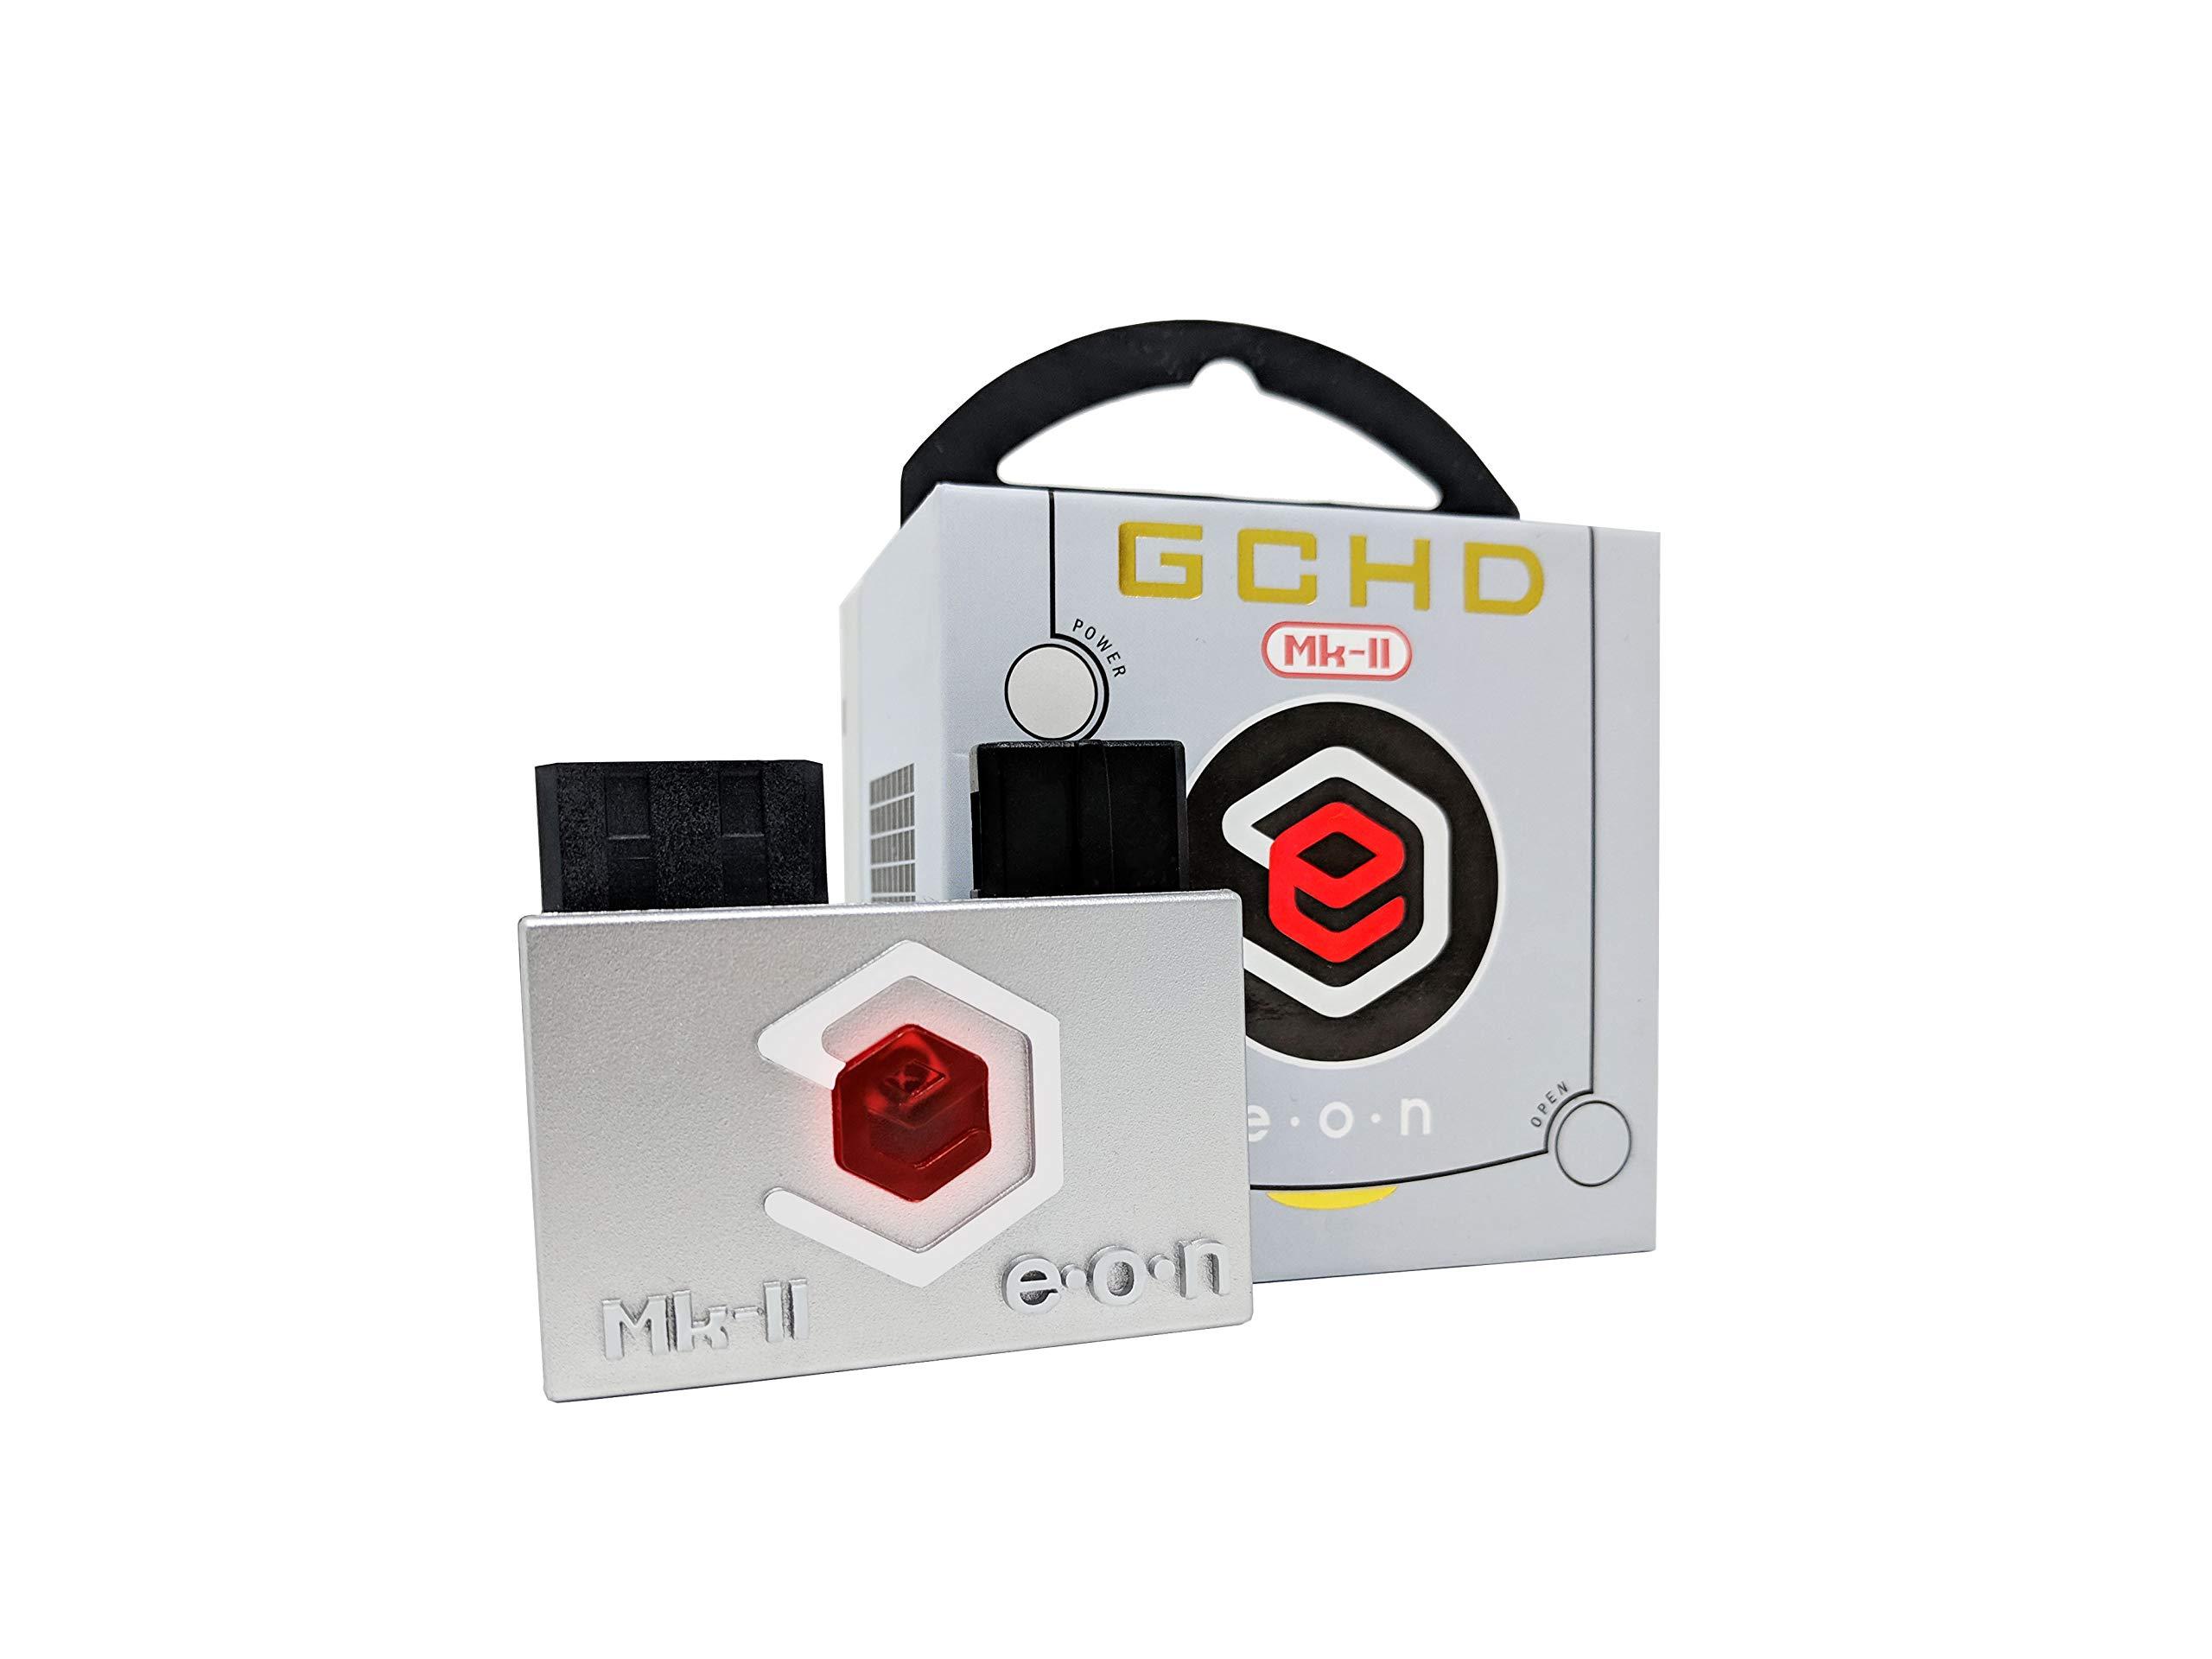 GCHD Mk-II | GameCube HDMI Adapter (480Platinum)